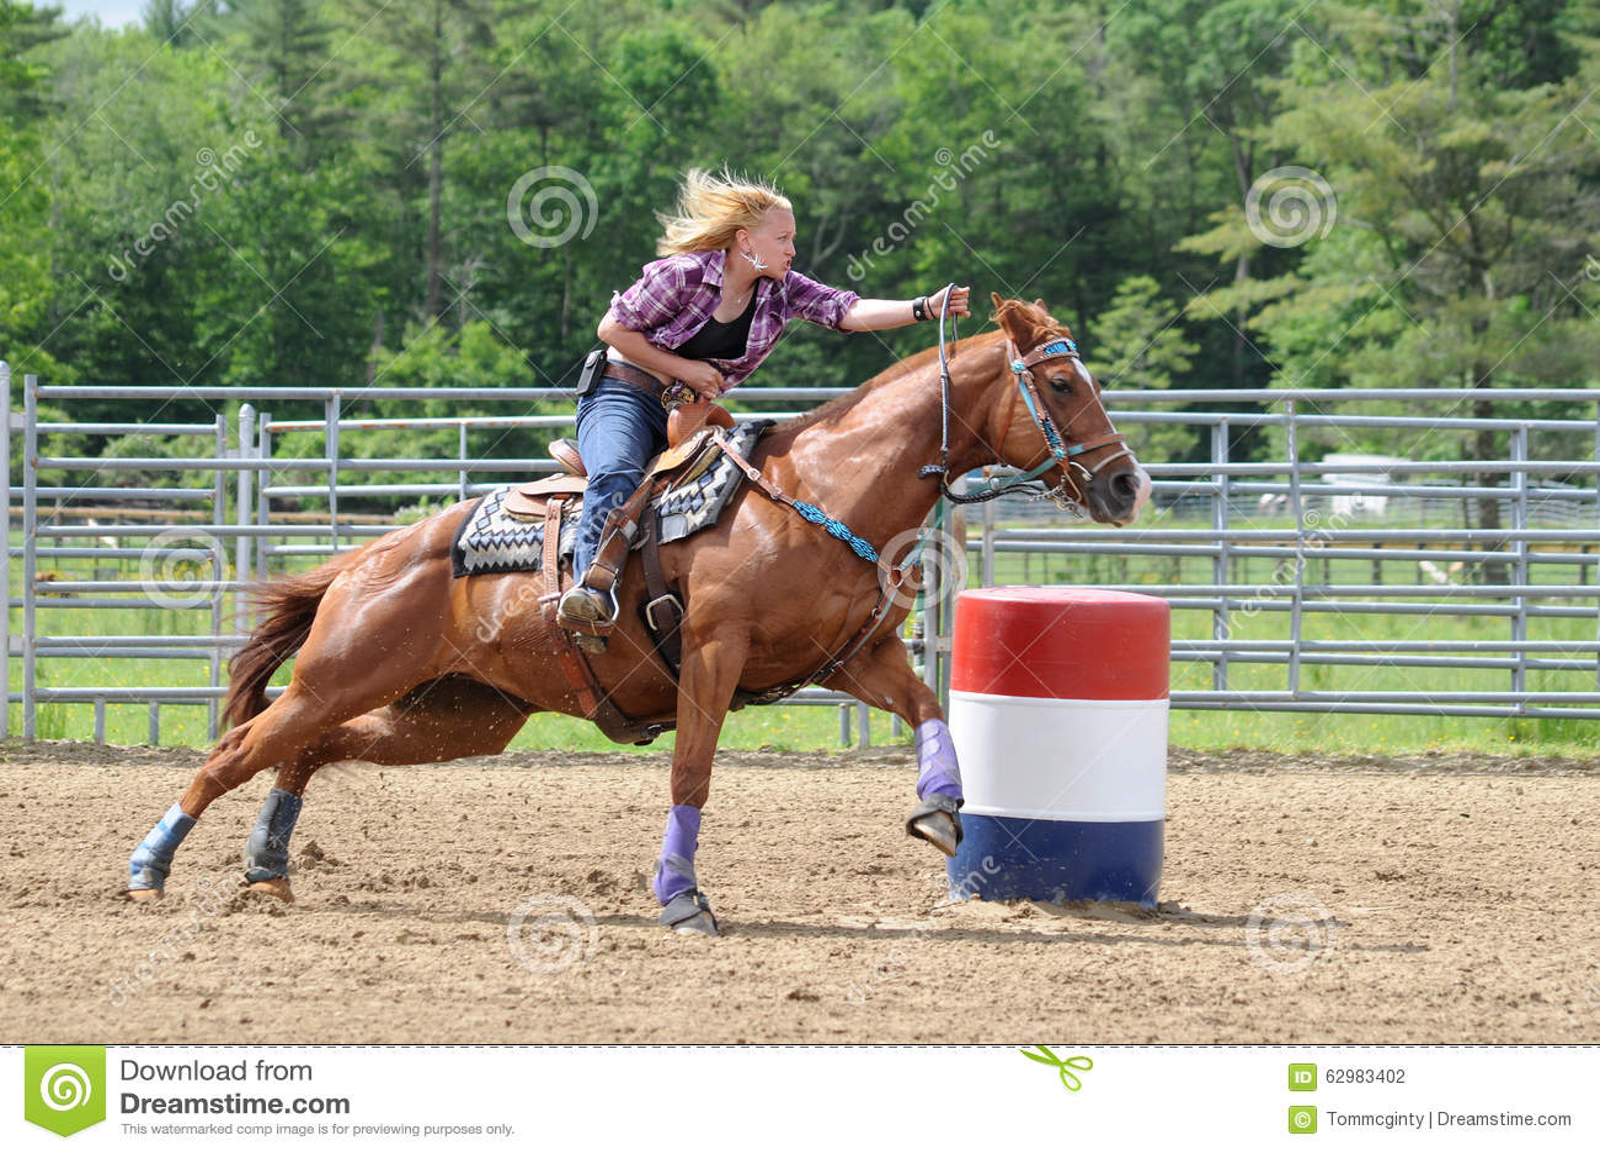 Rodeo Ladies Barrel Racing Stock Photo (Edit Now) 12851260